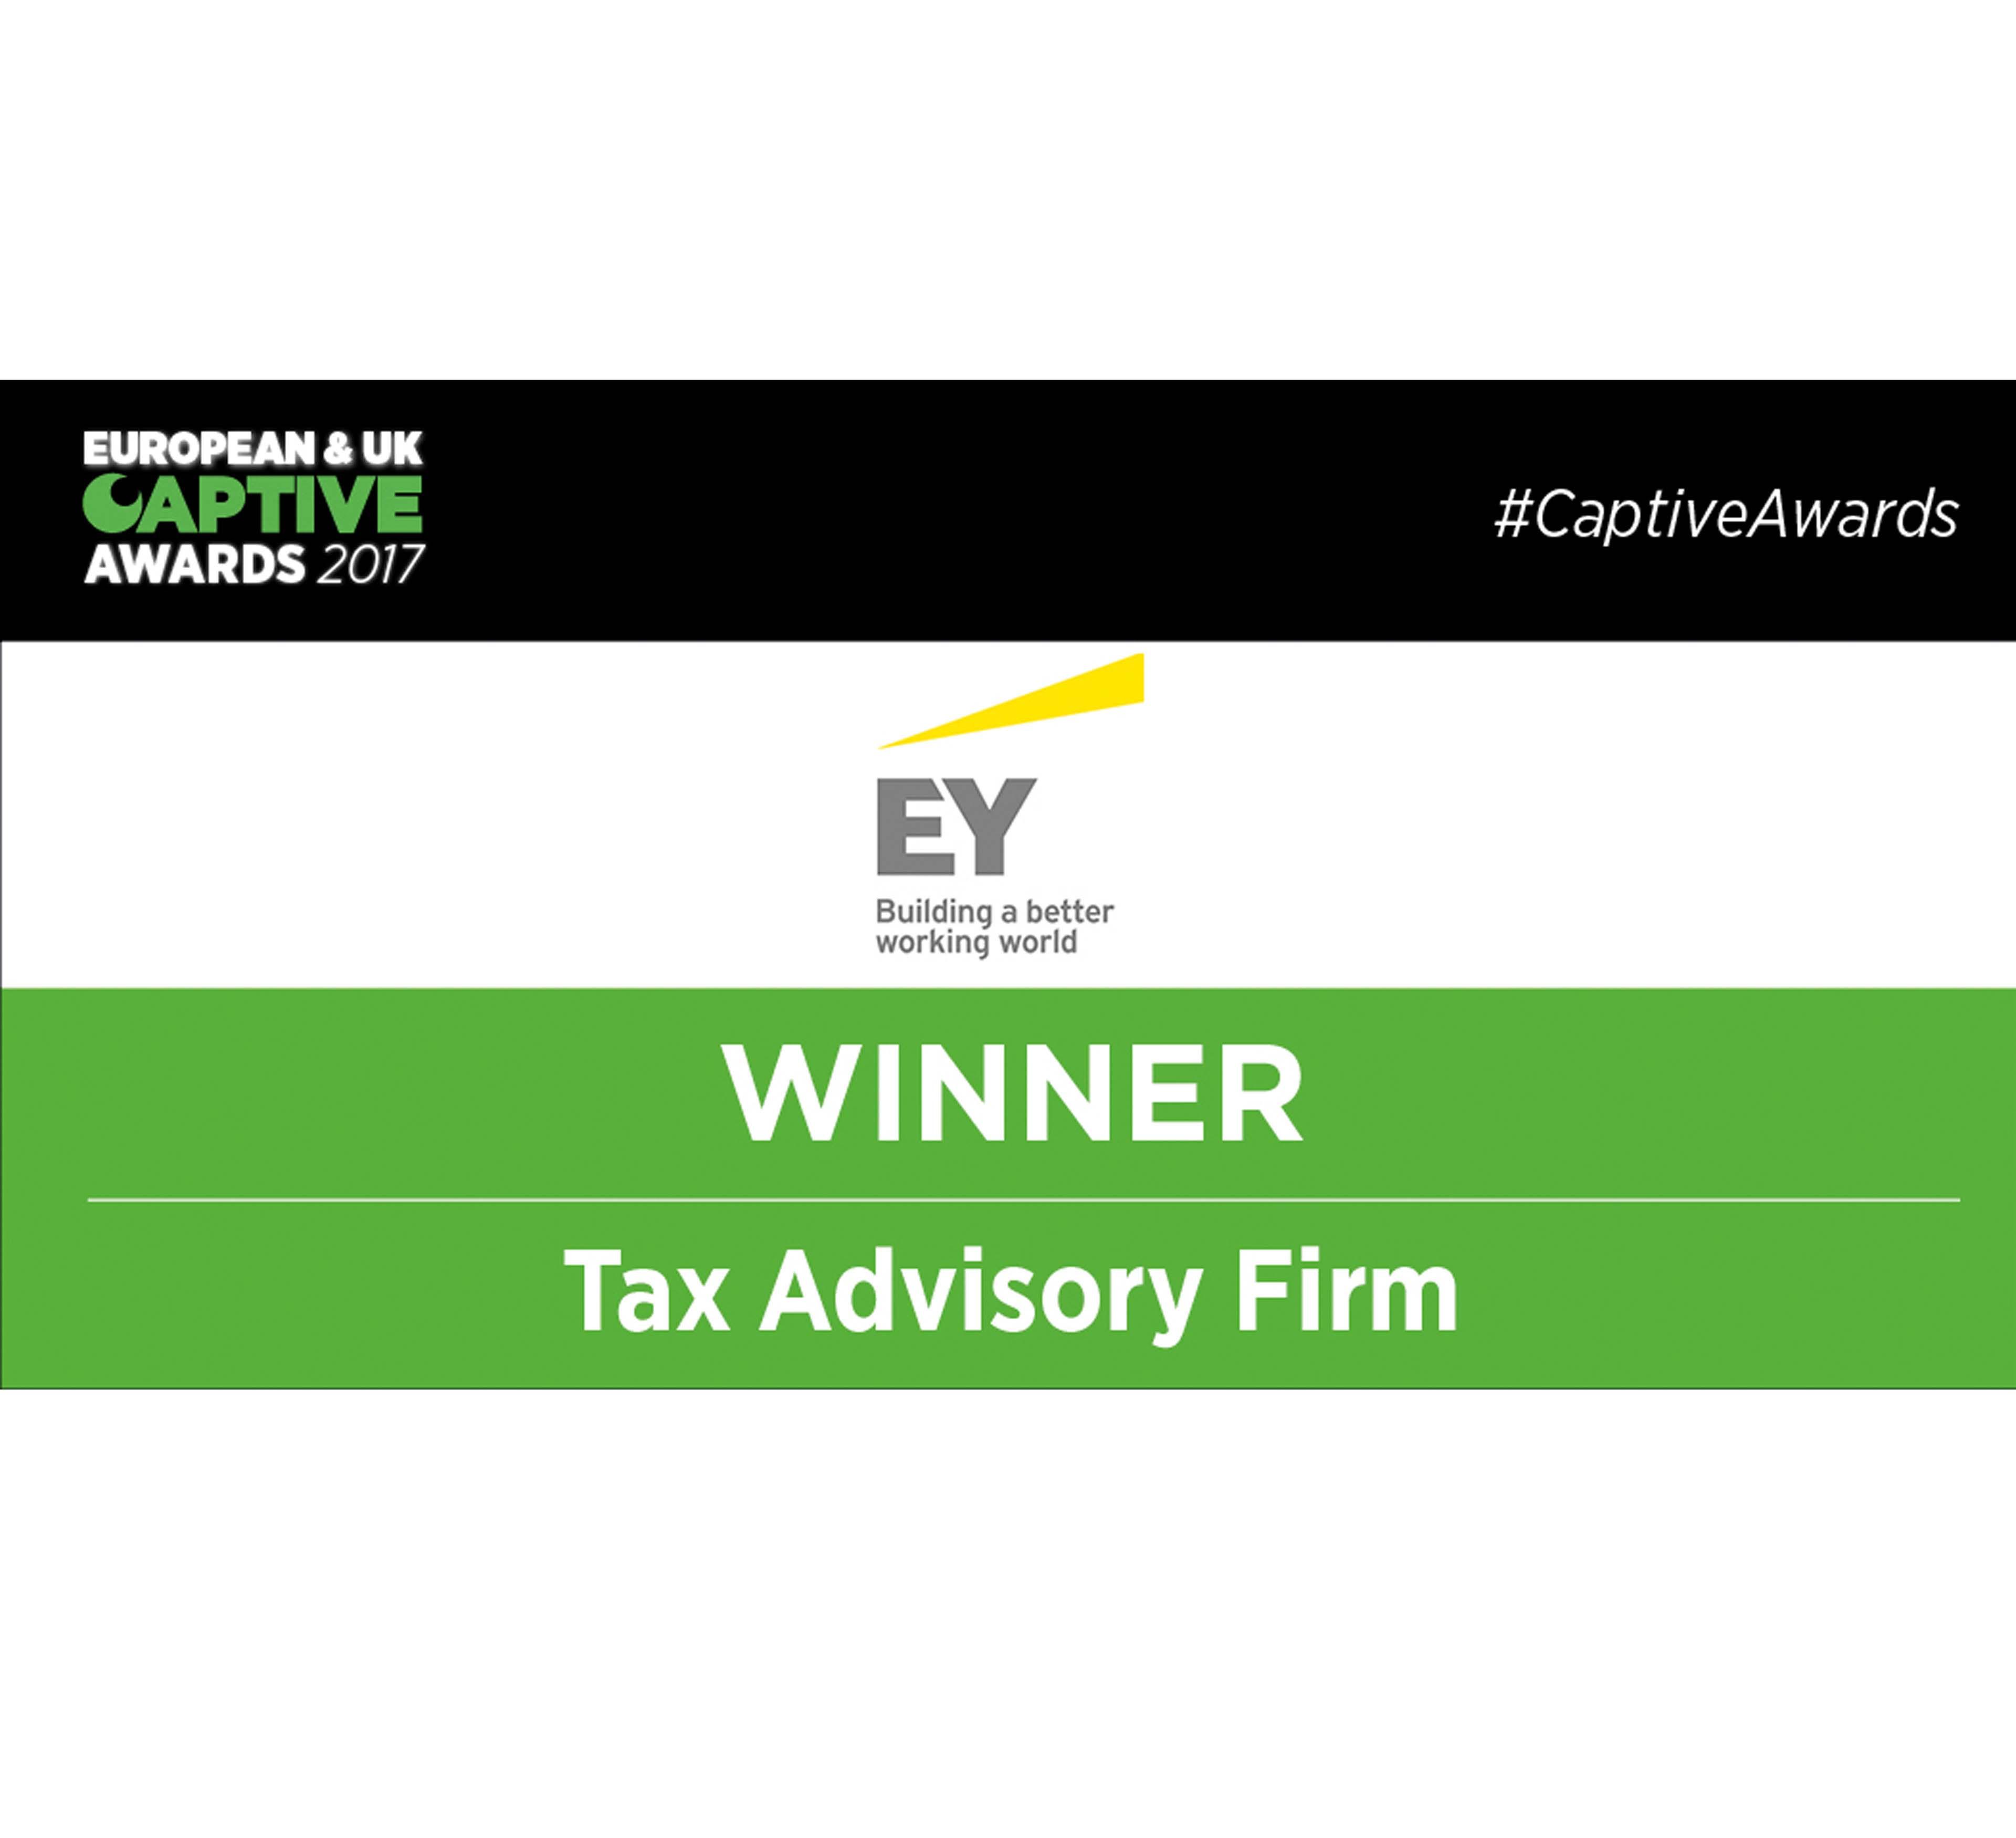 European & UK Captive Awards 2017 Winner Tax Advisory Firm EY